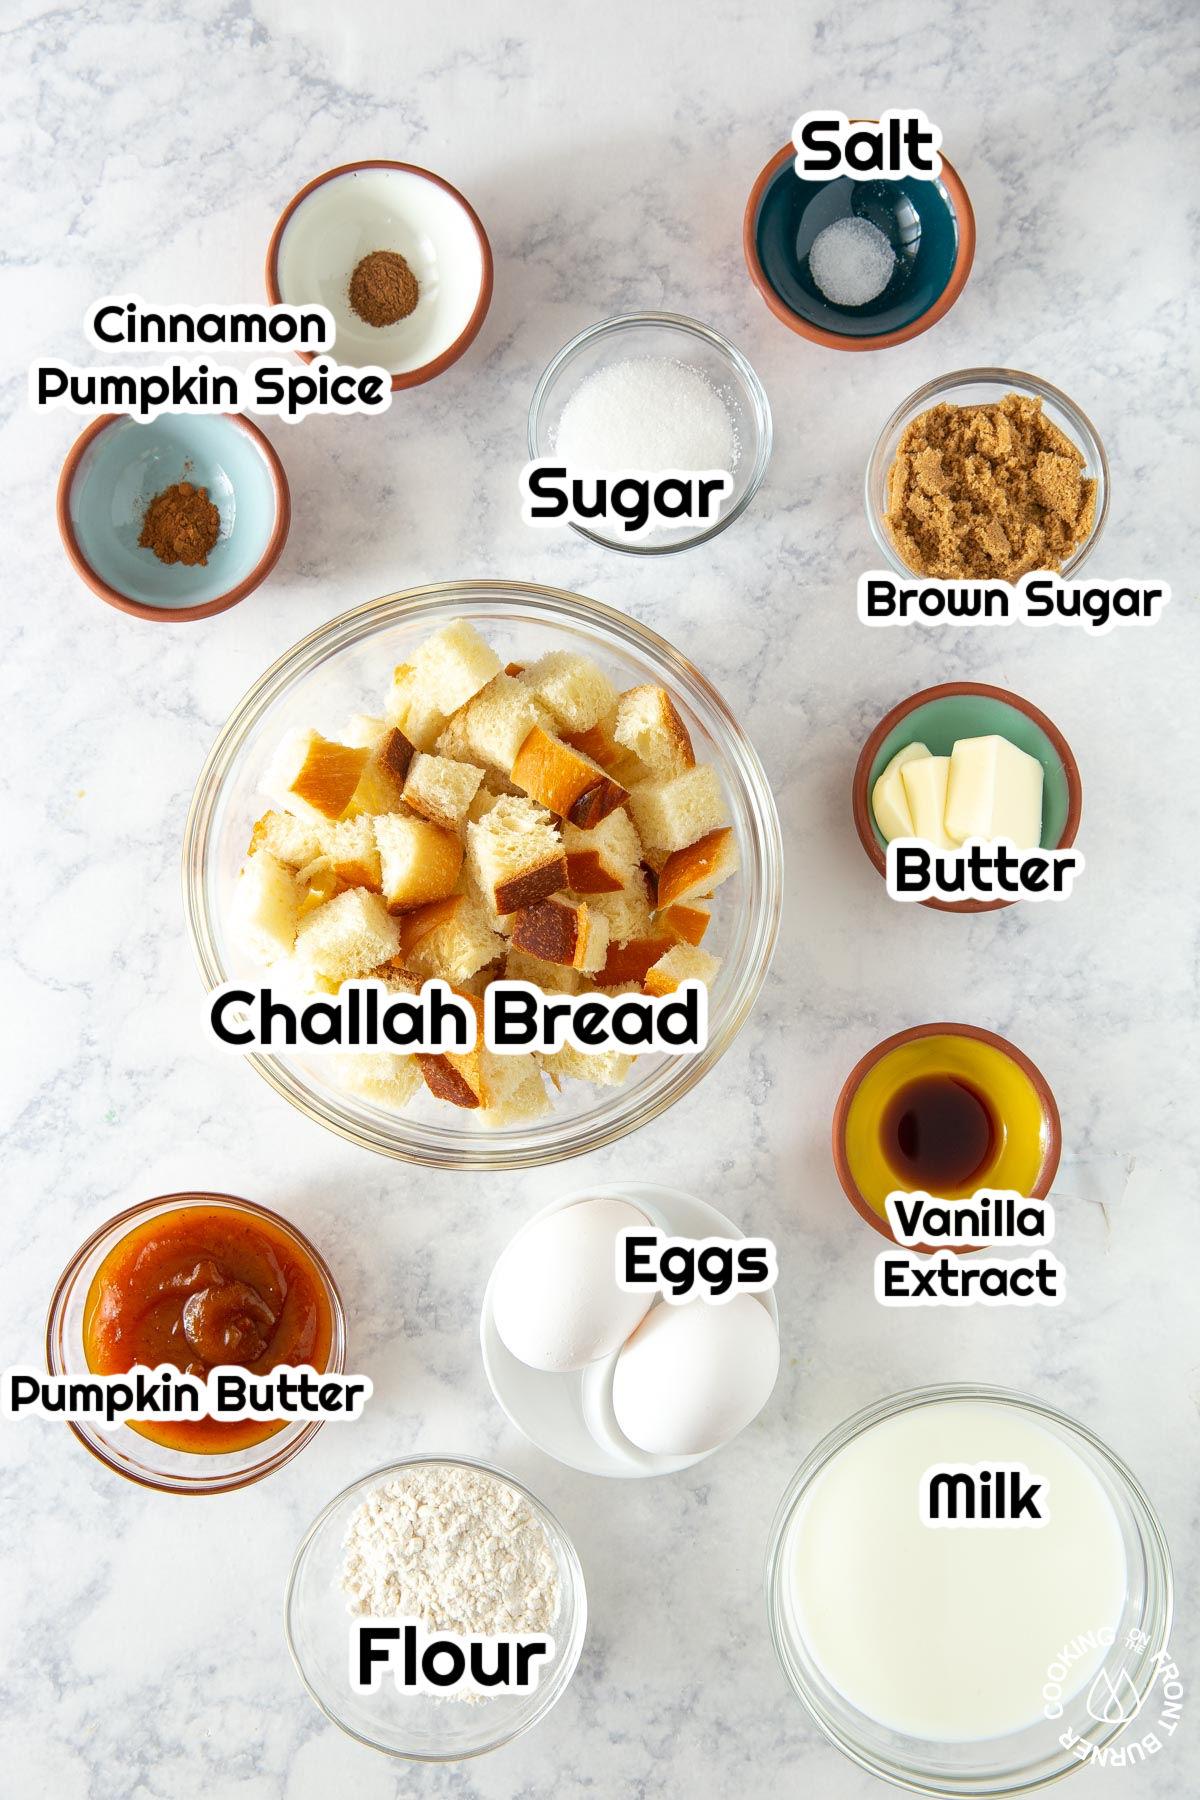 flour, sugar, vanilla, bread cubes, sugar,eggs in bowls on a board